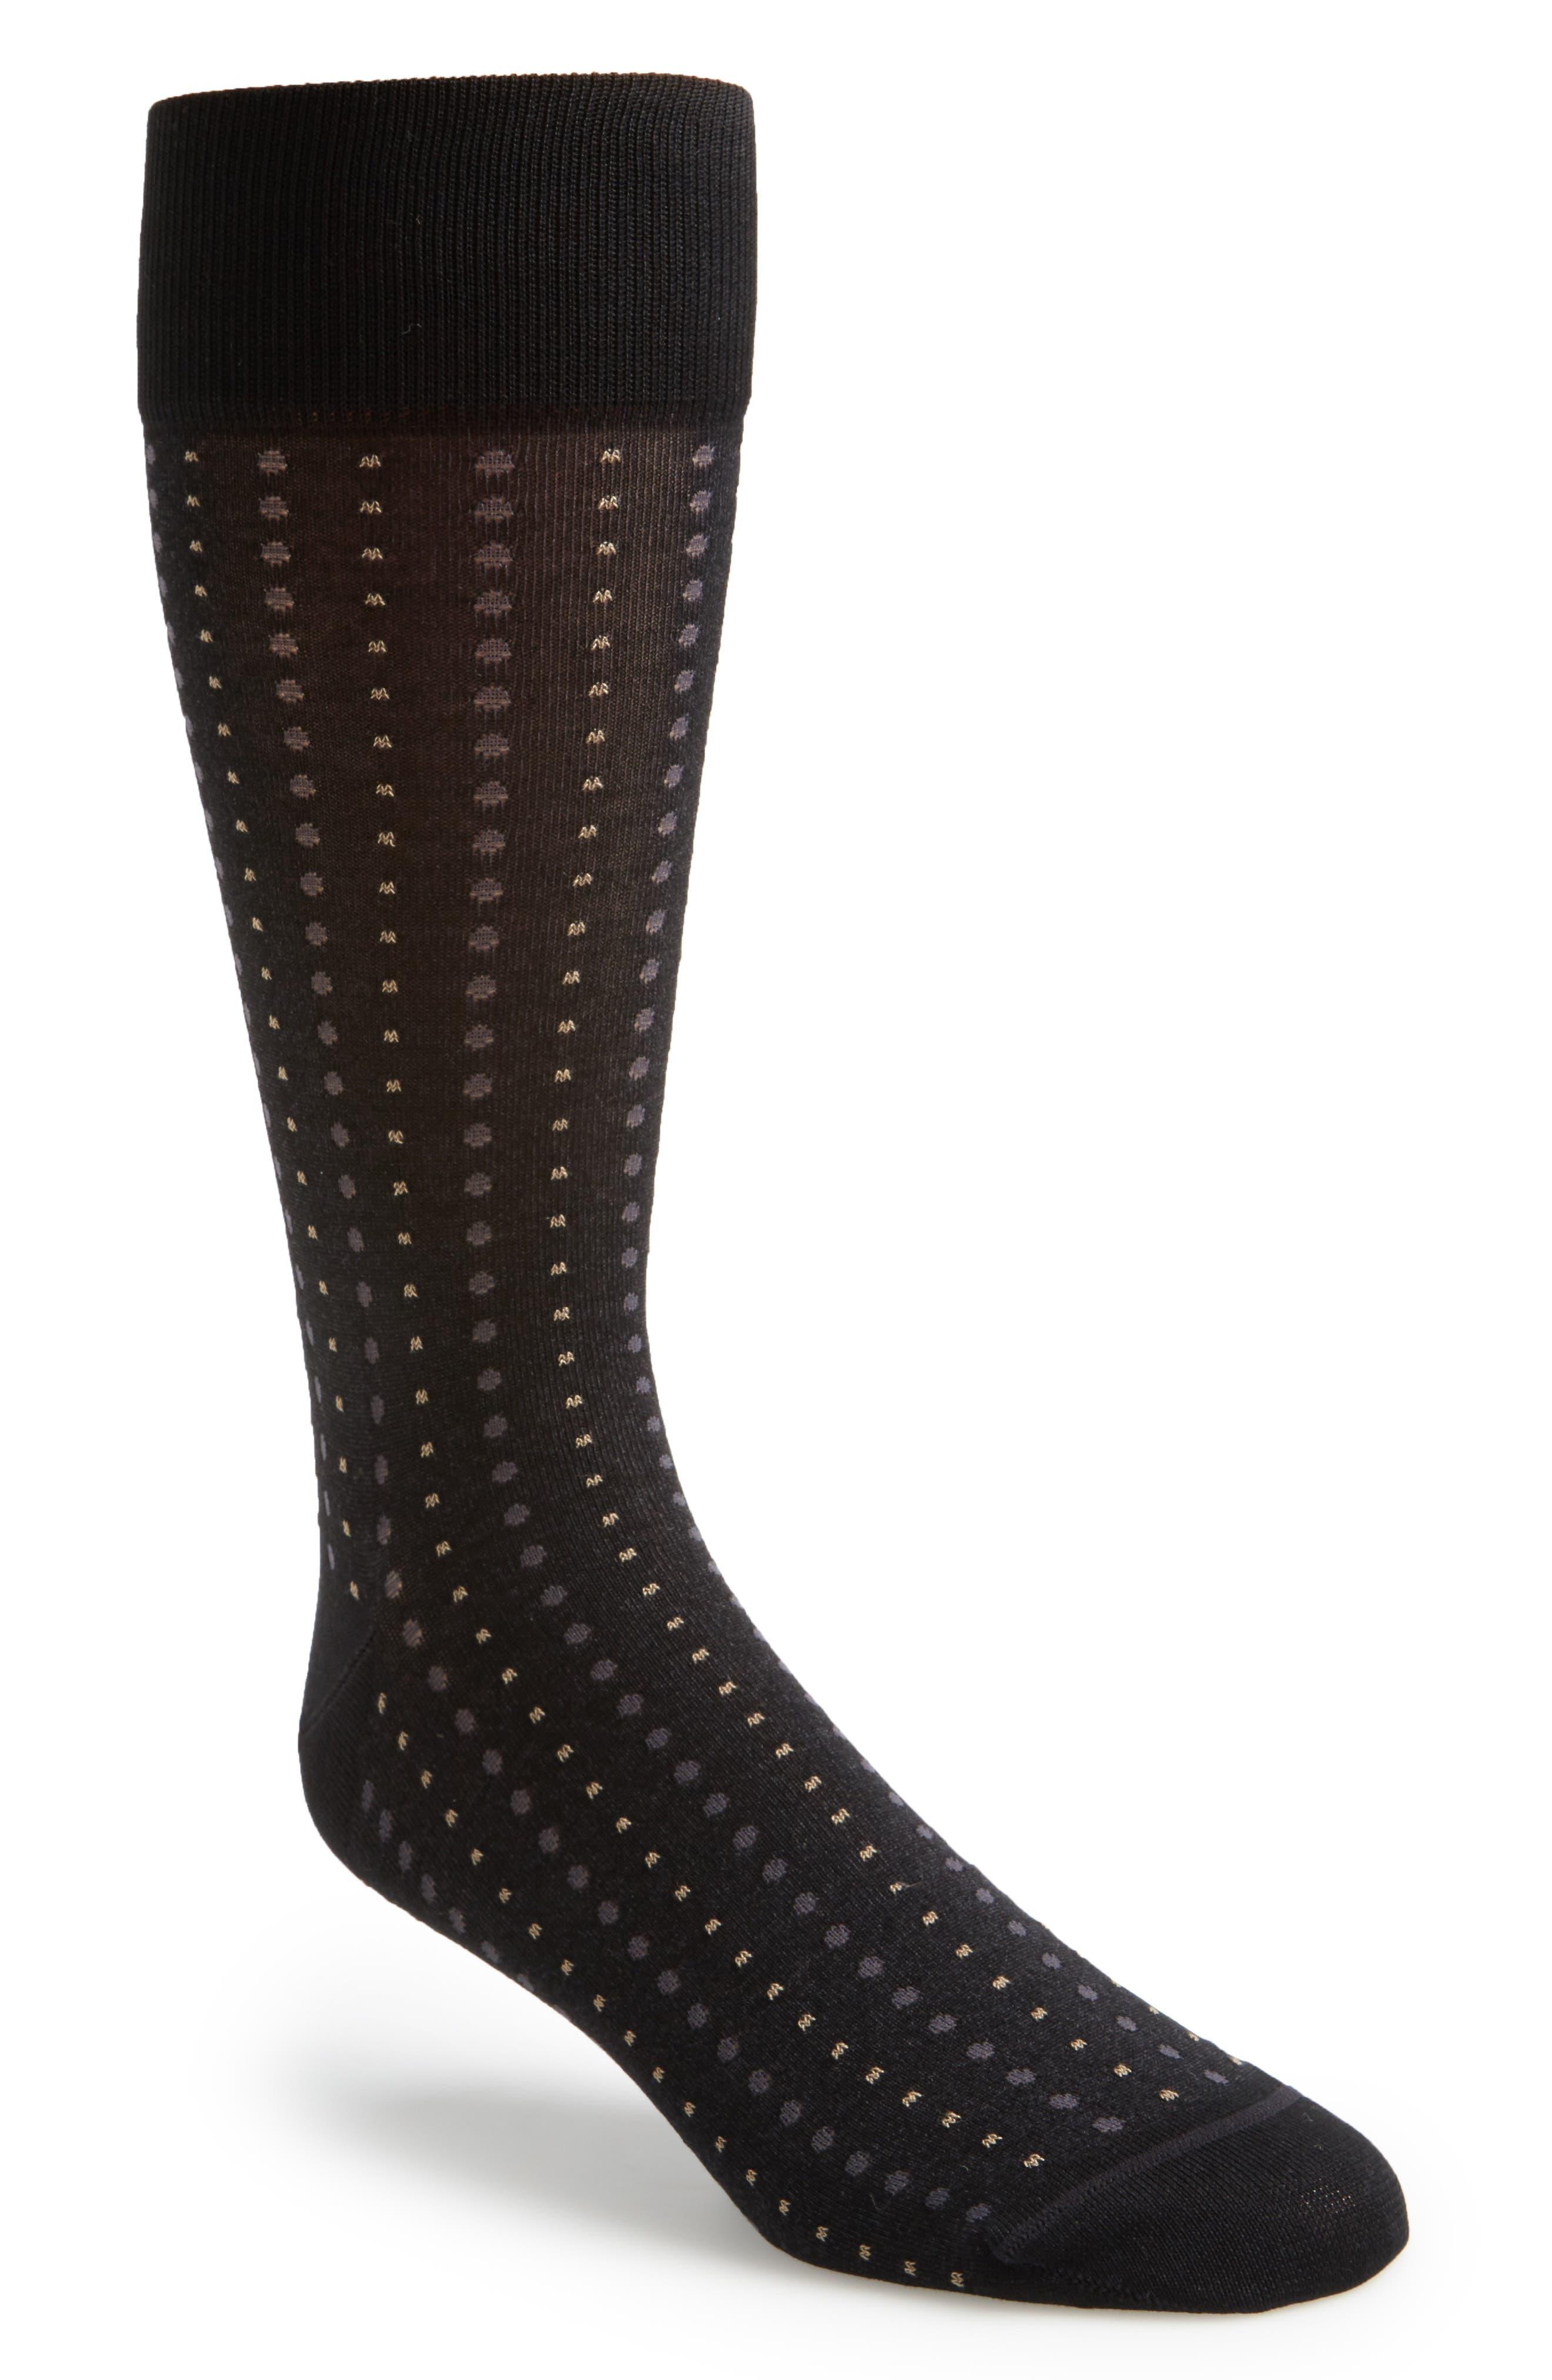 Alternate Image 1 Selected - John W. Nordstrom® Mini Dot Socks